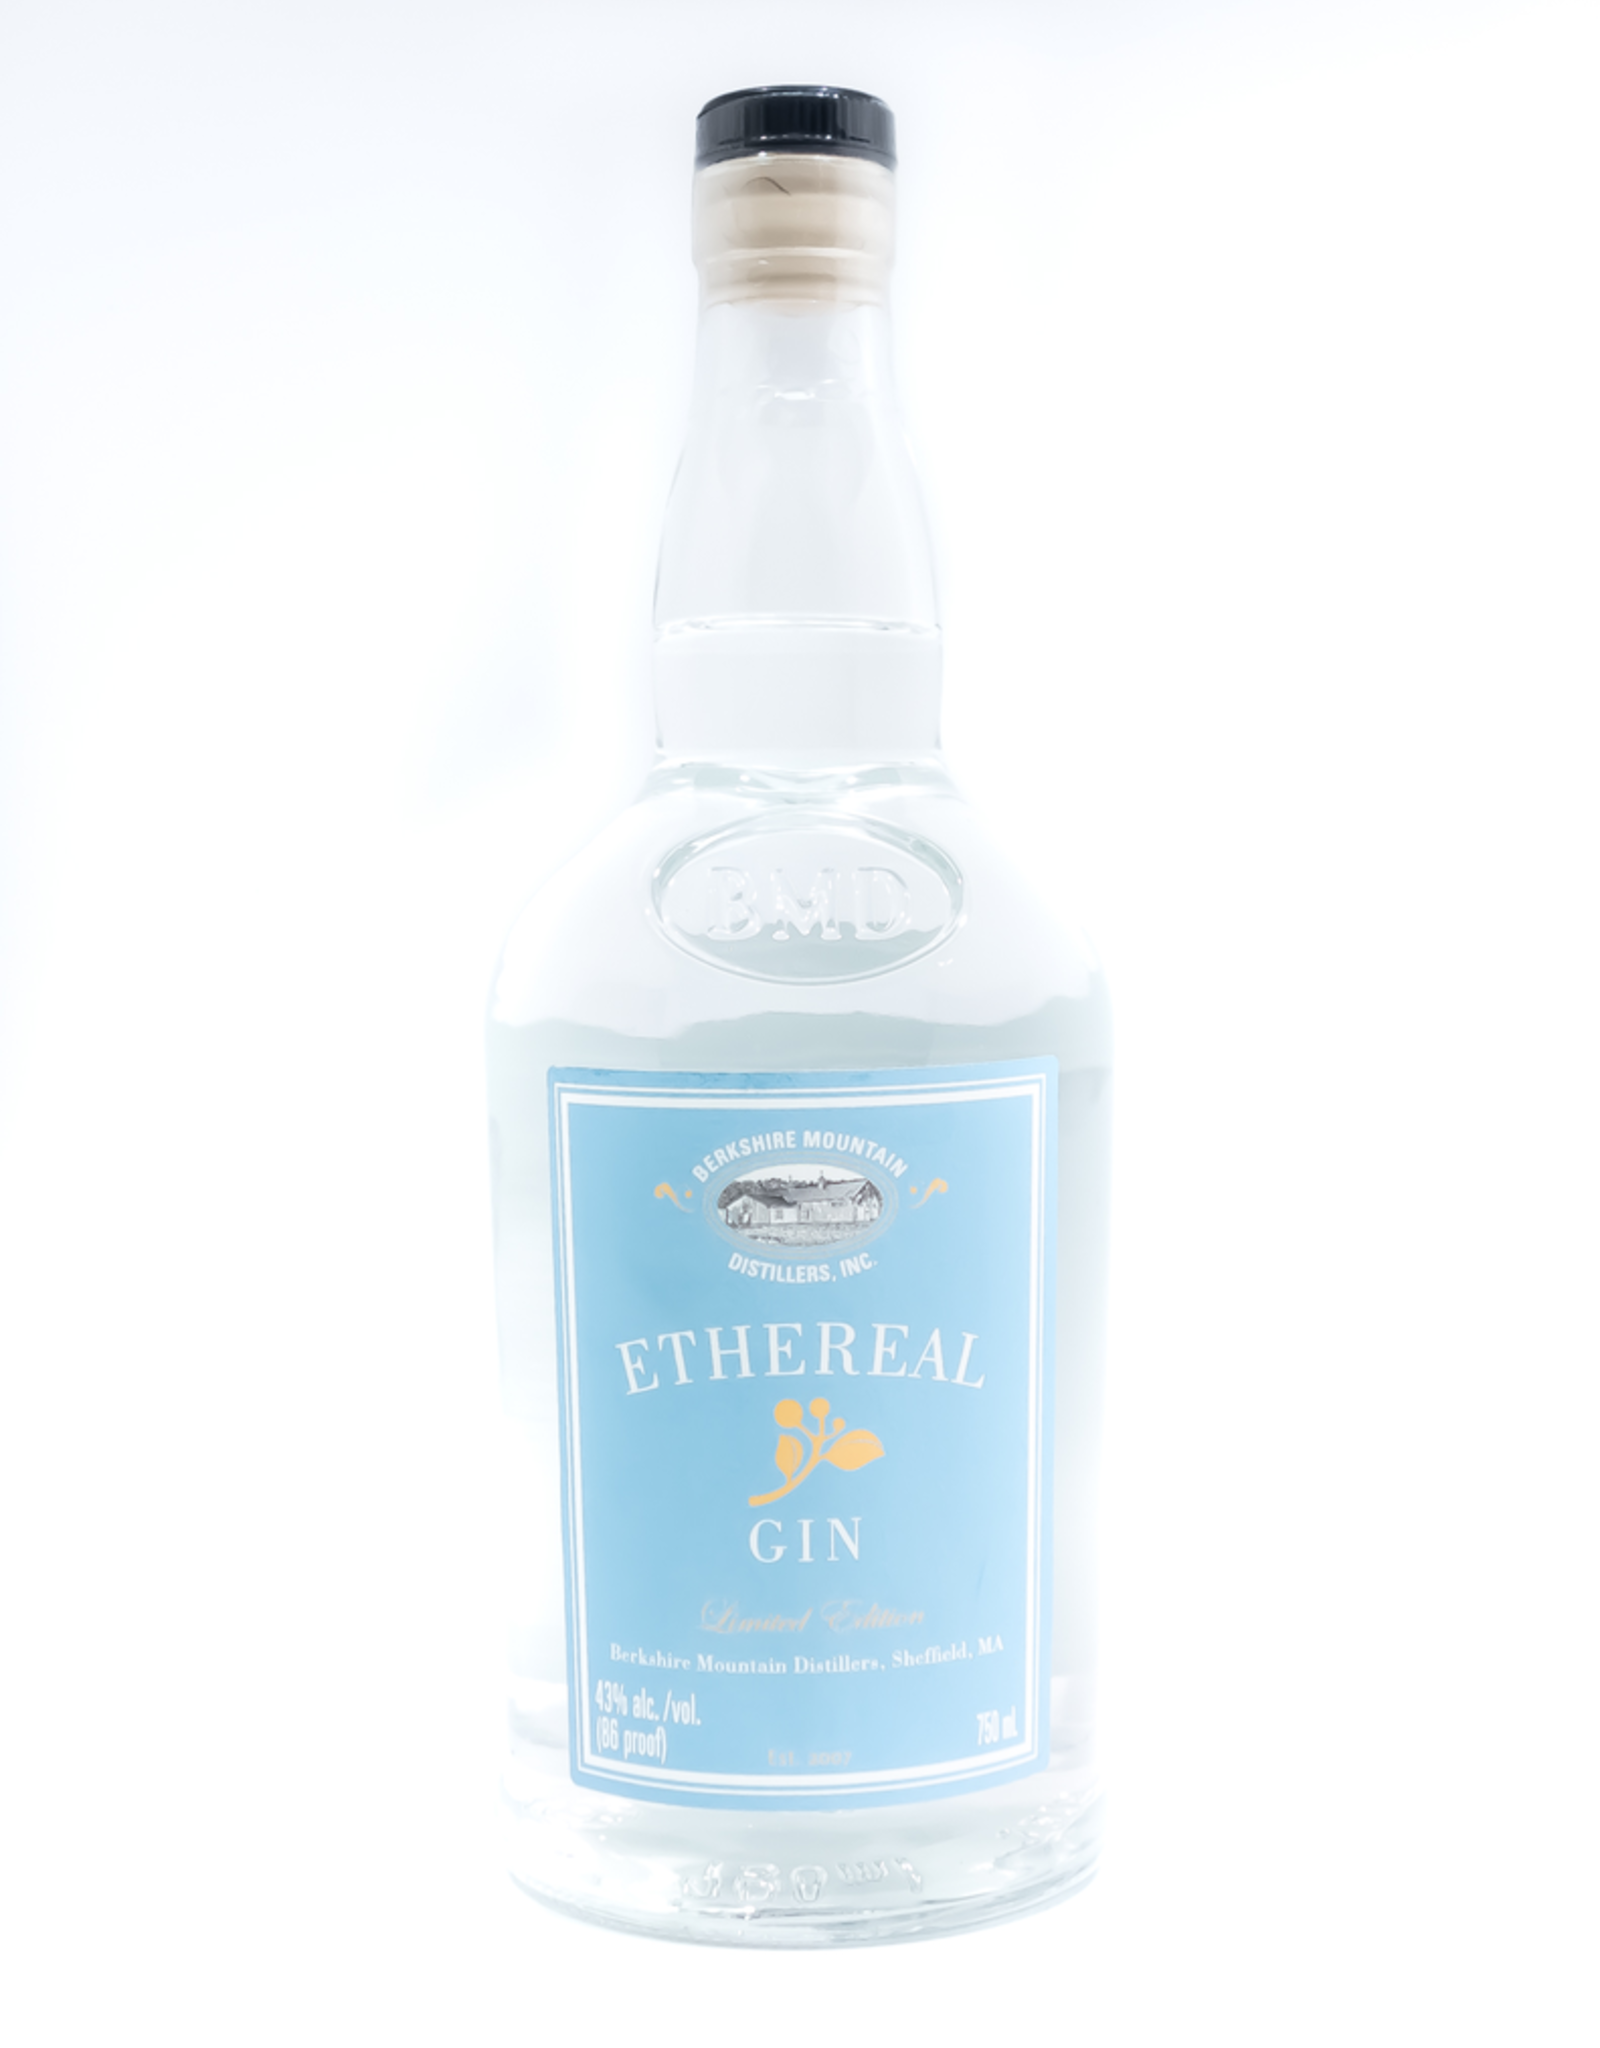 Spirits-Gin Berkshire Mountain Distillers Ethereal Gin 750ml